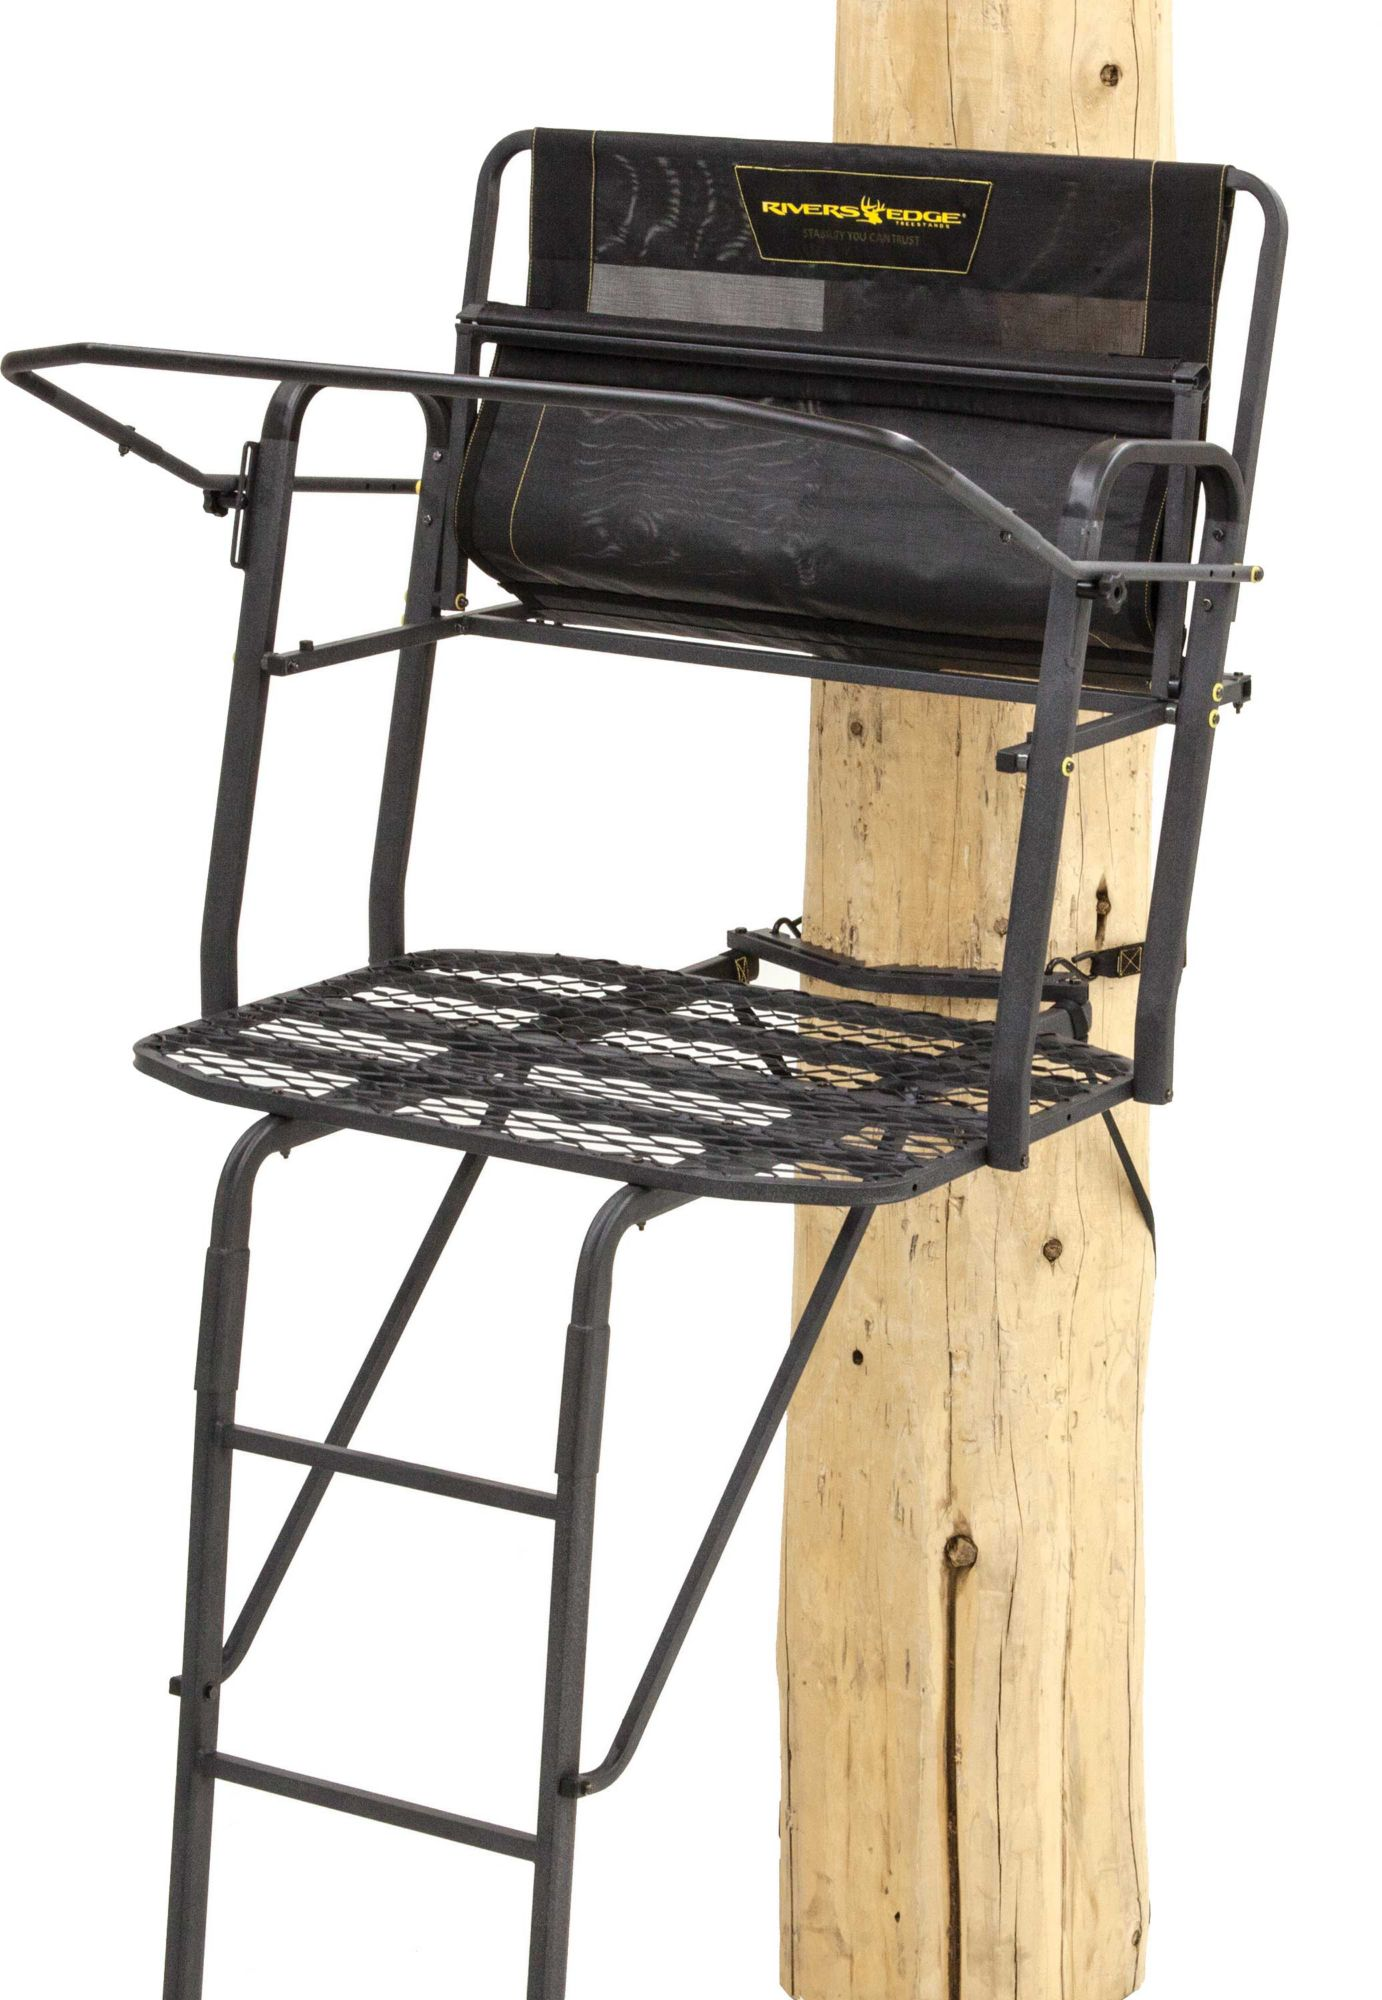 Rivers Edge Lockdown 2-Man 15' Ladder Stand, Men's thumbnail